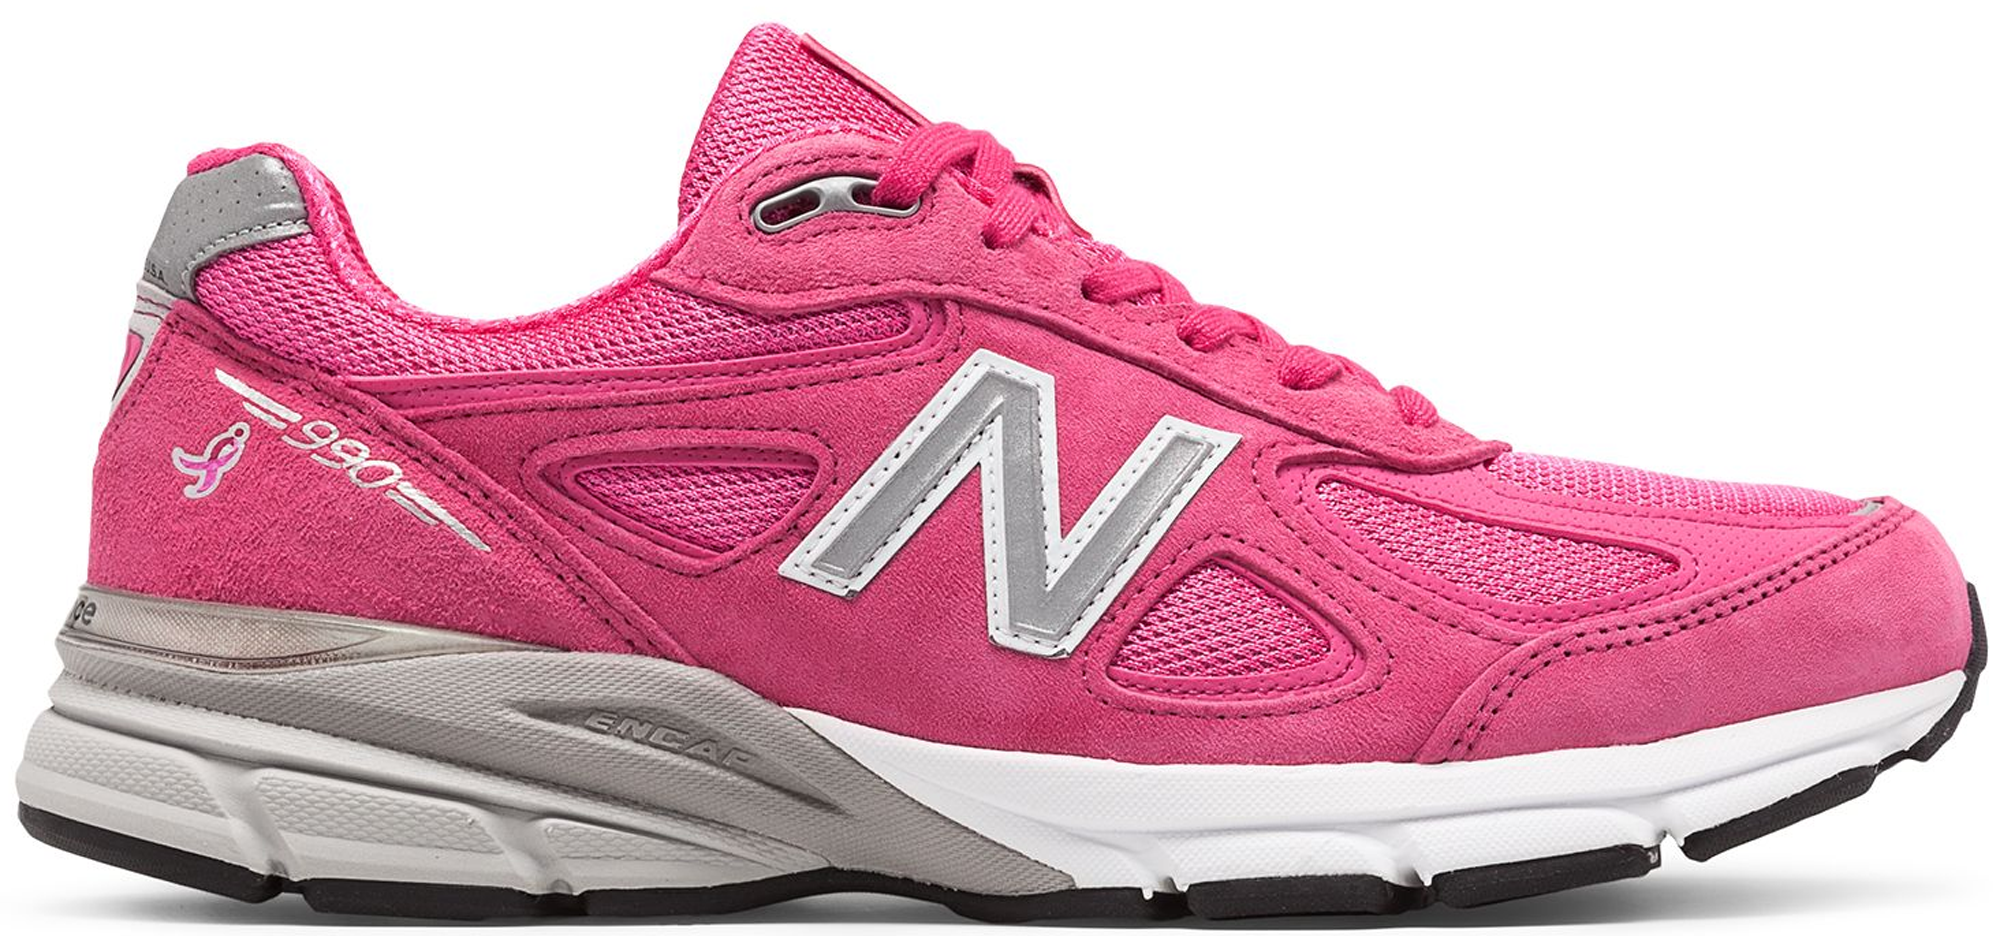 New Balance 990v4 Pink Ribbon (Komen